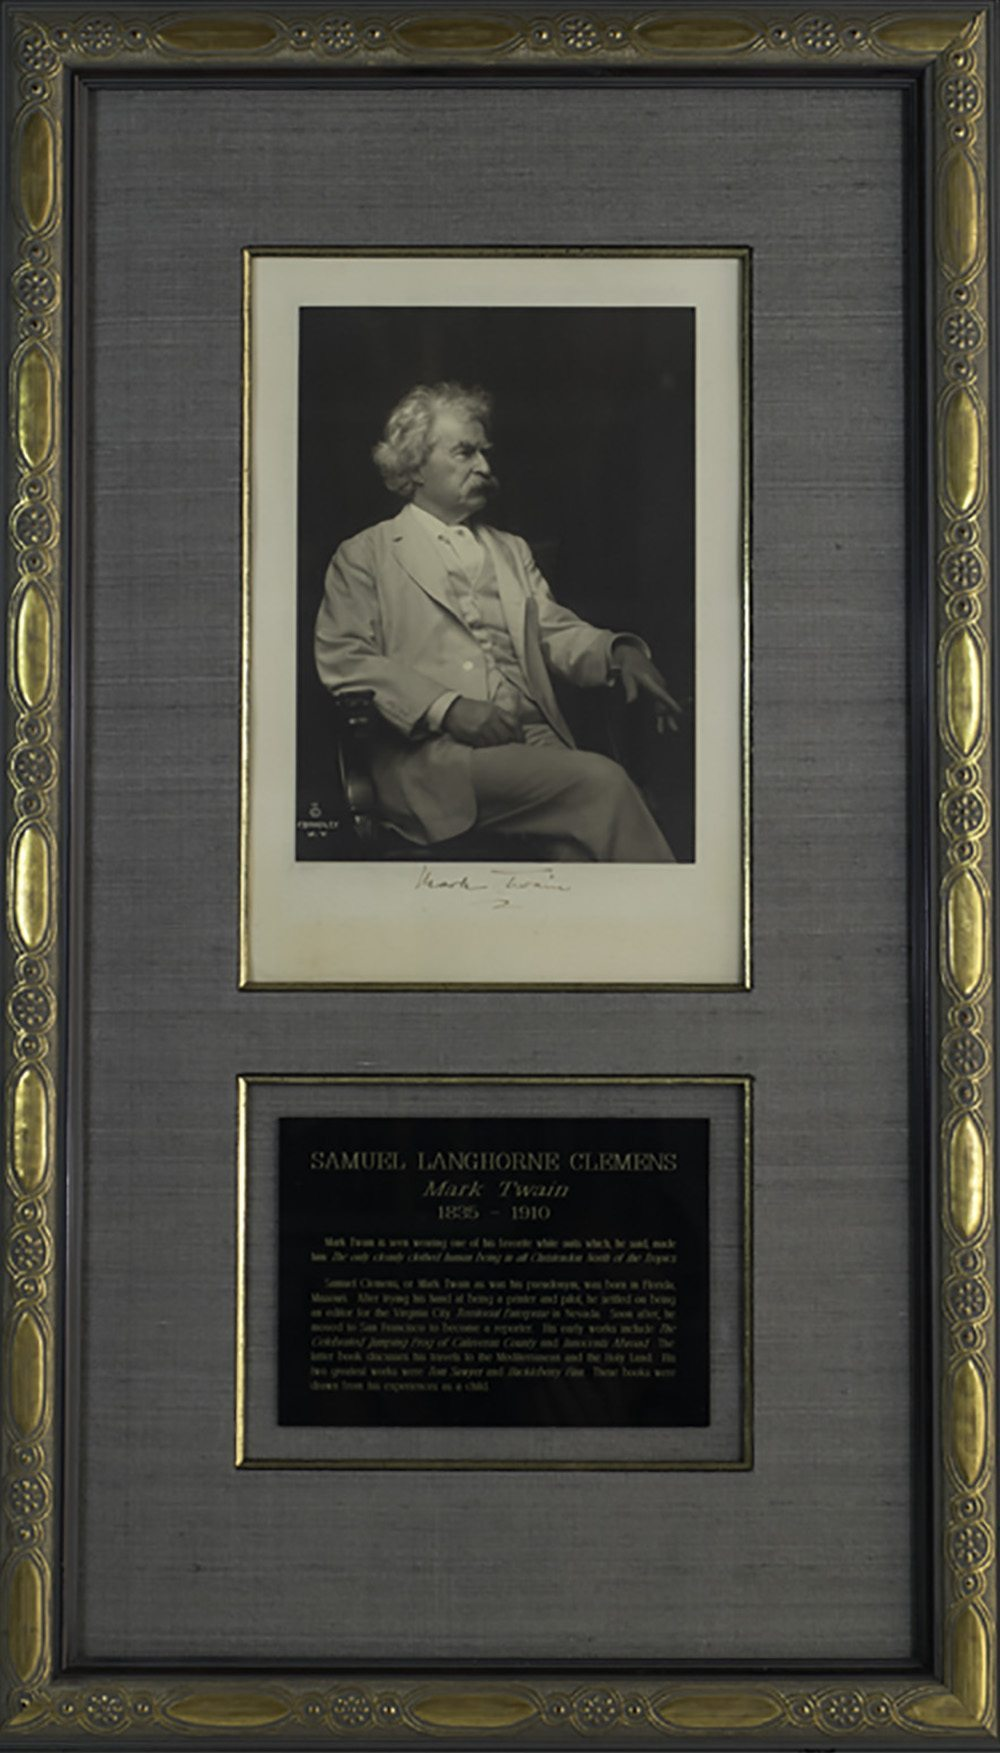 Mark Twain Signed Photograph.